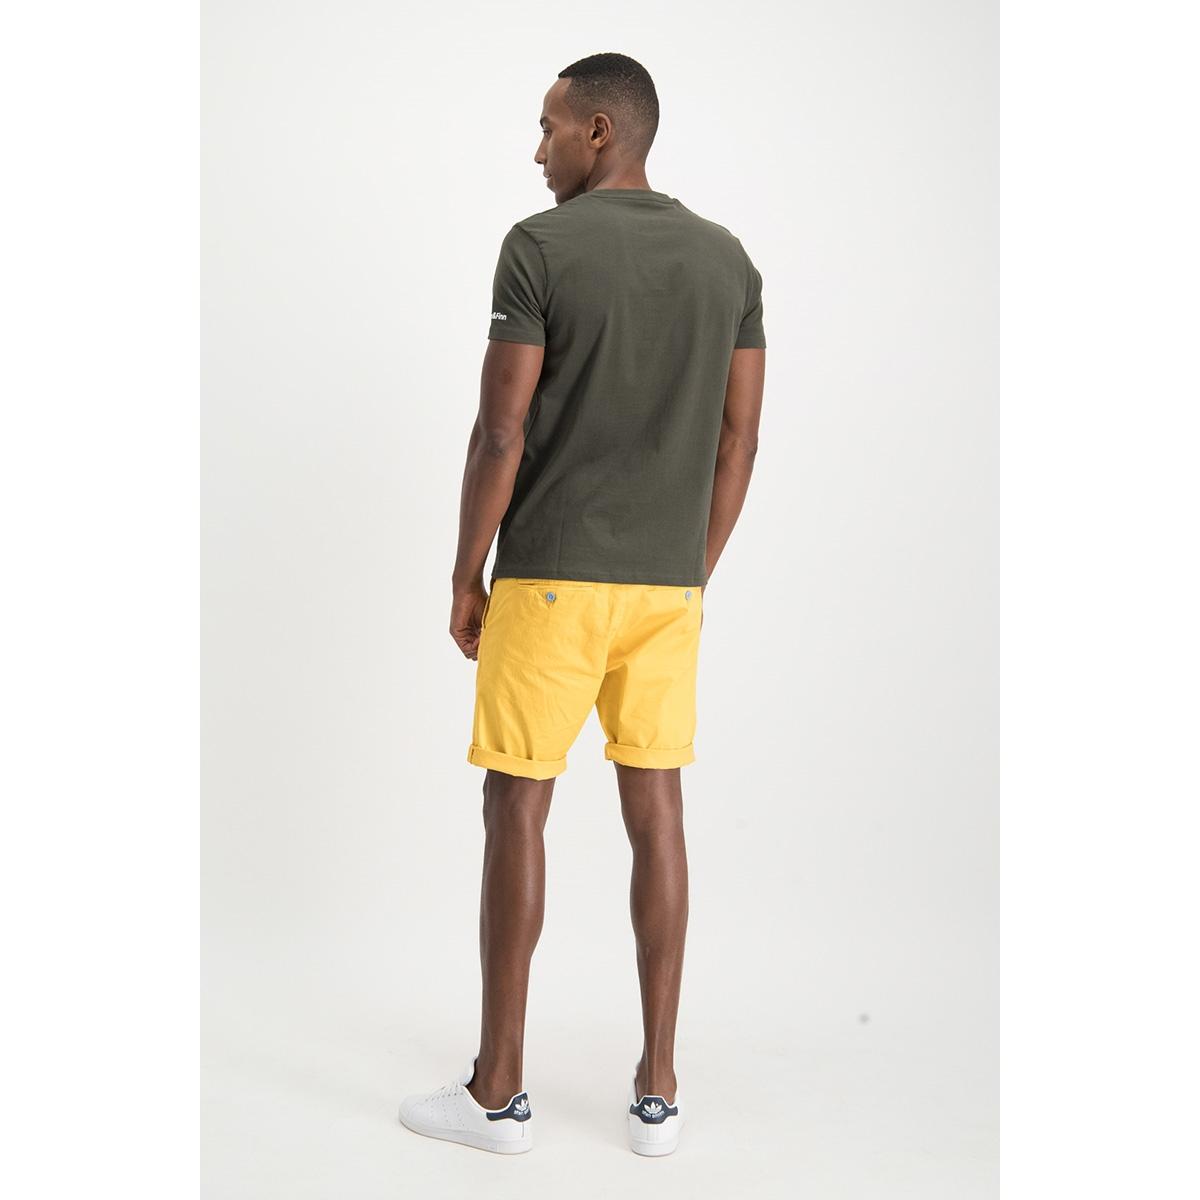 tee small globe mu13 0014 haze & finn t-shirt army green-mellow yellow